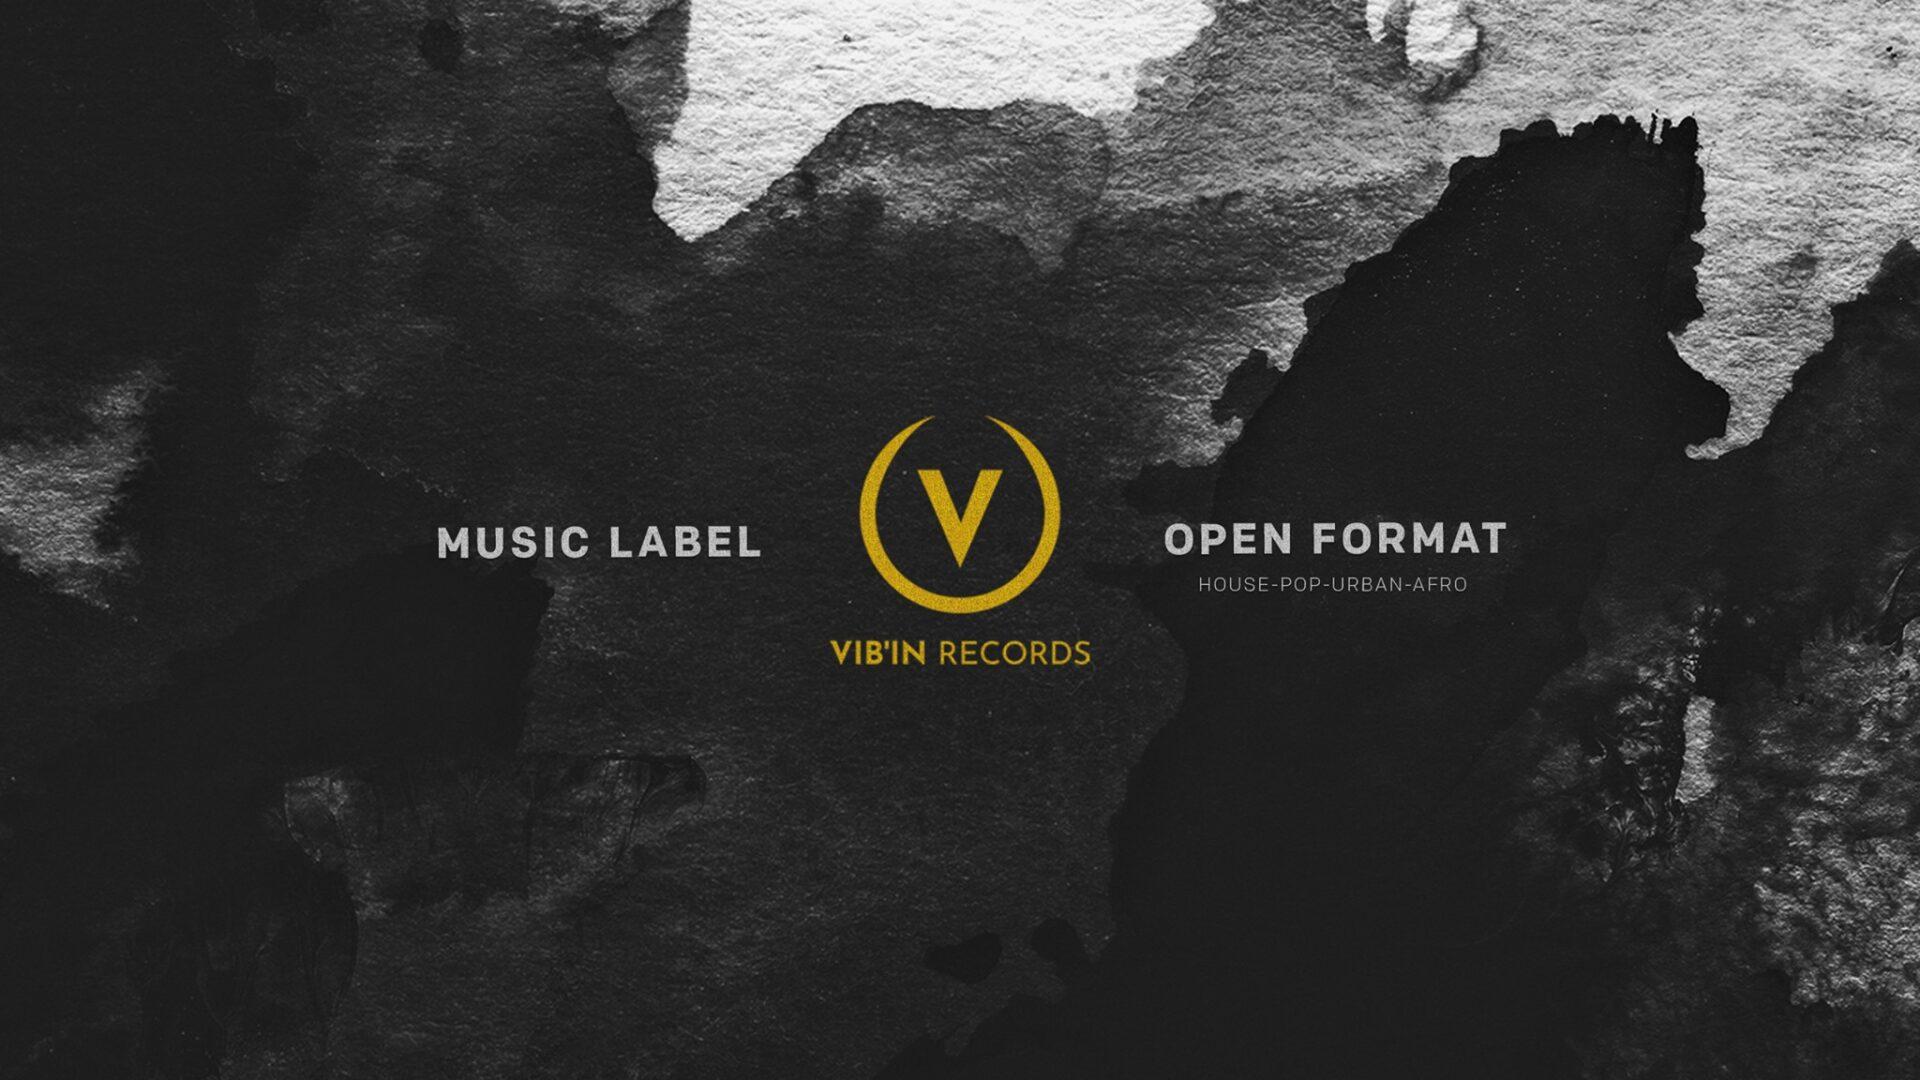 Vib'in records